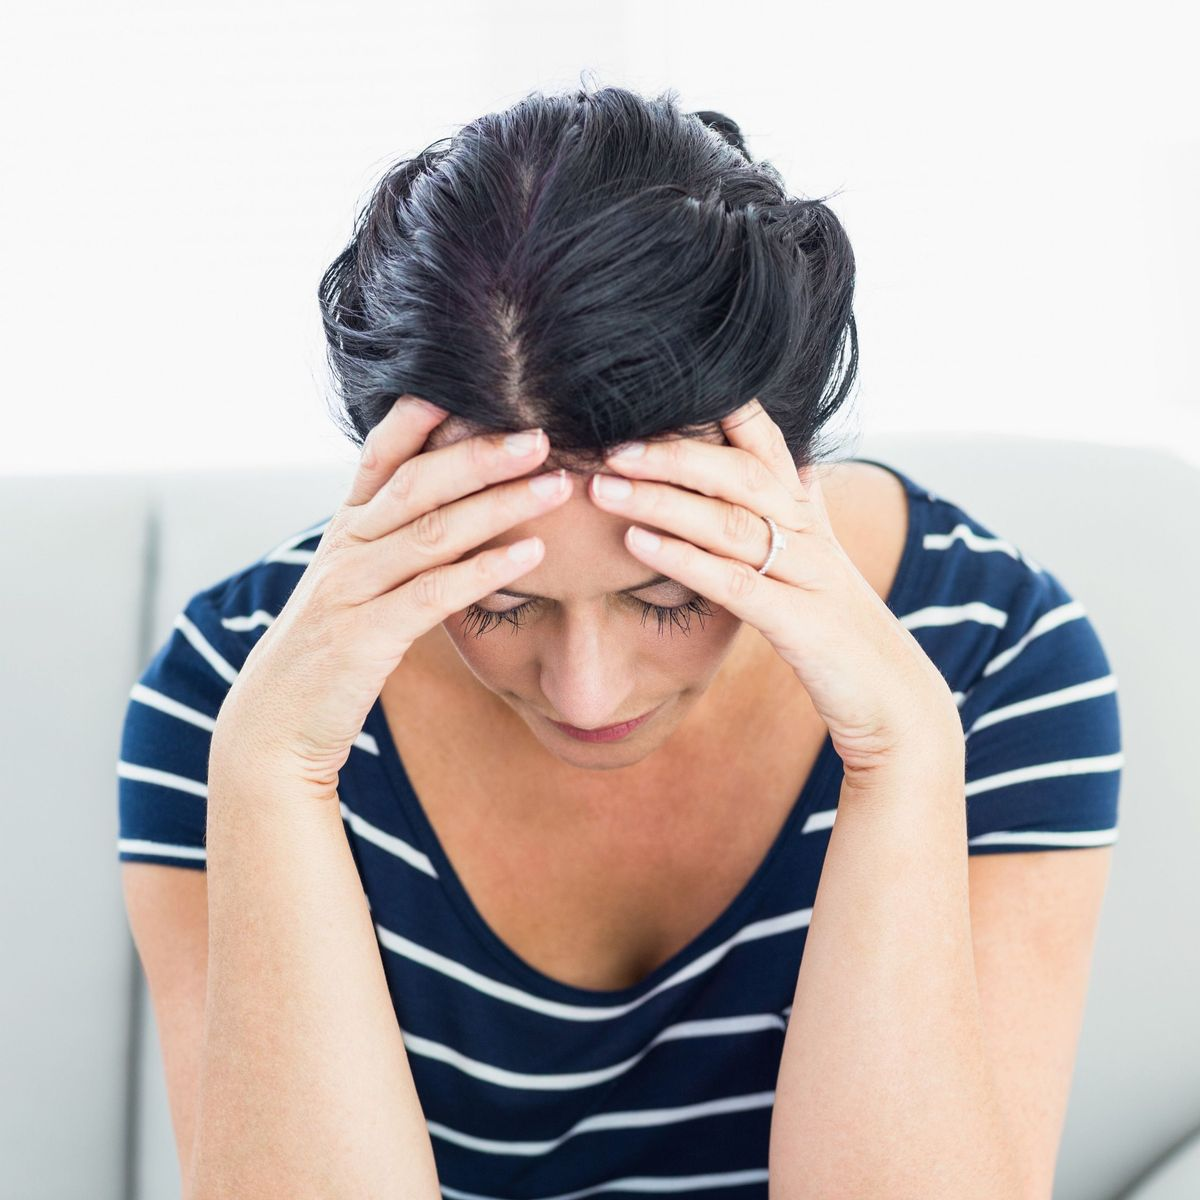 Panische angst vor thrombose